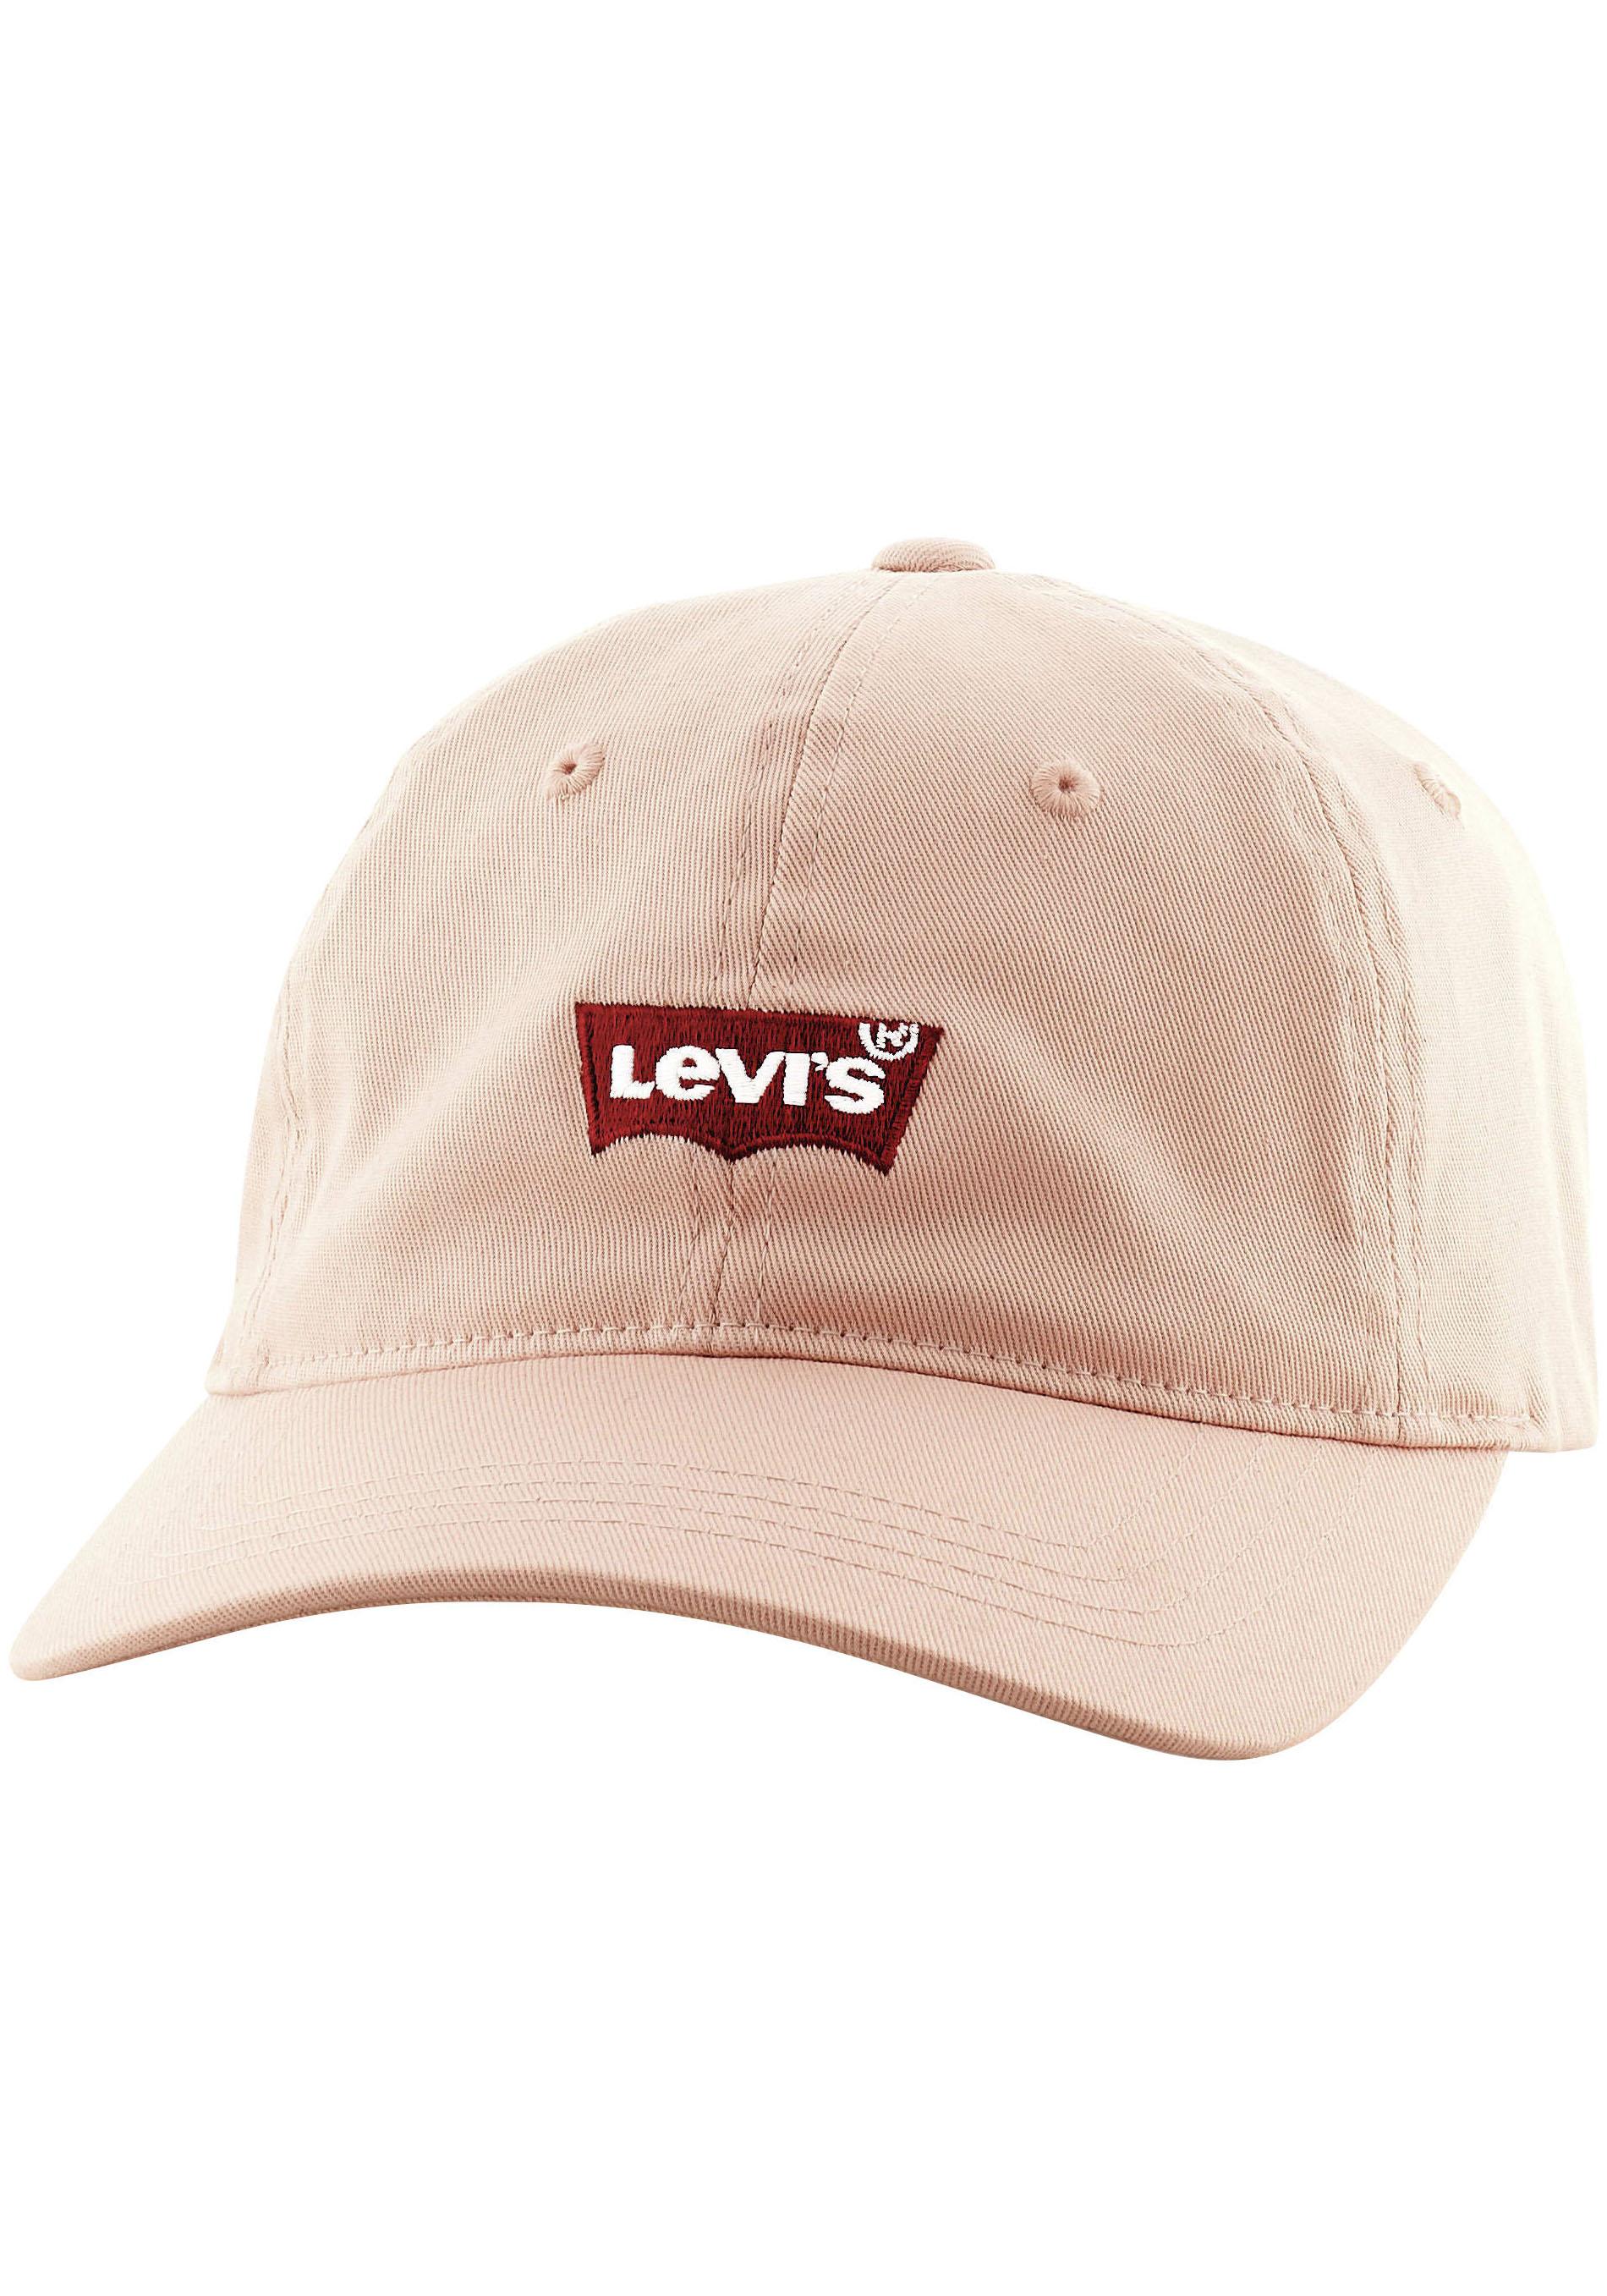 levis - Levi's Baseball Cap, Women's Mid Batwing Baseball Cap